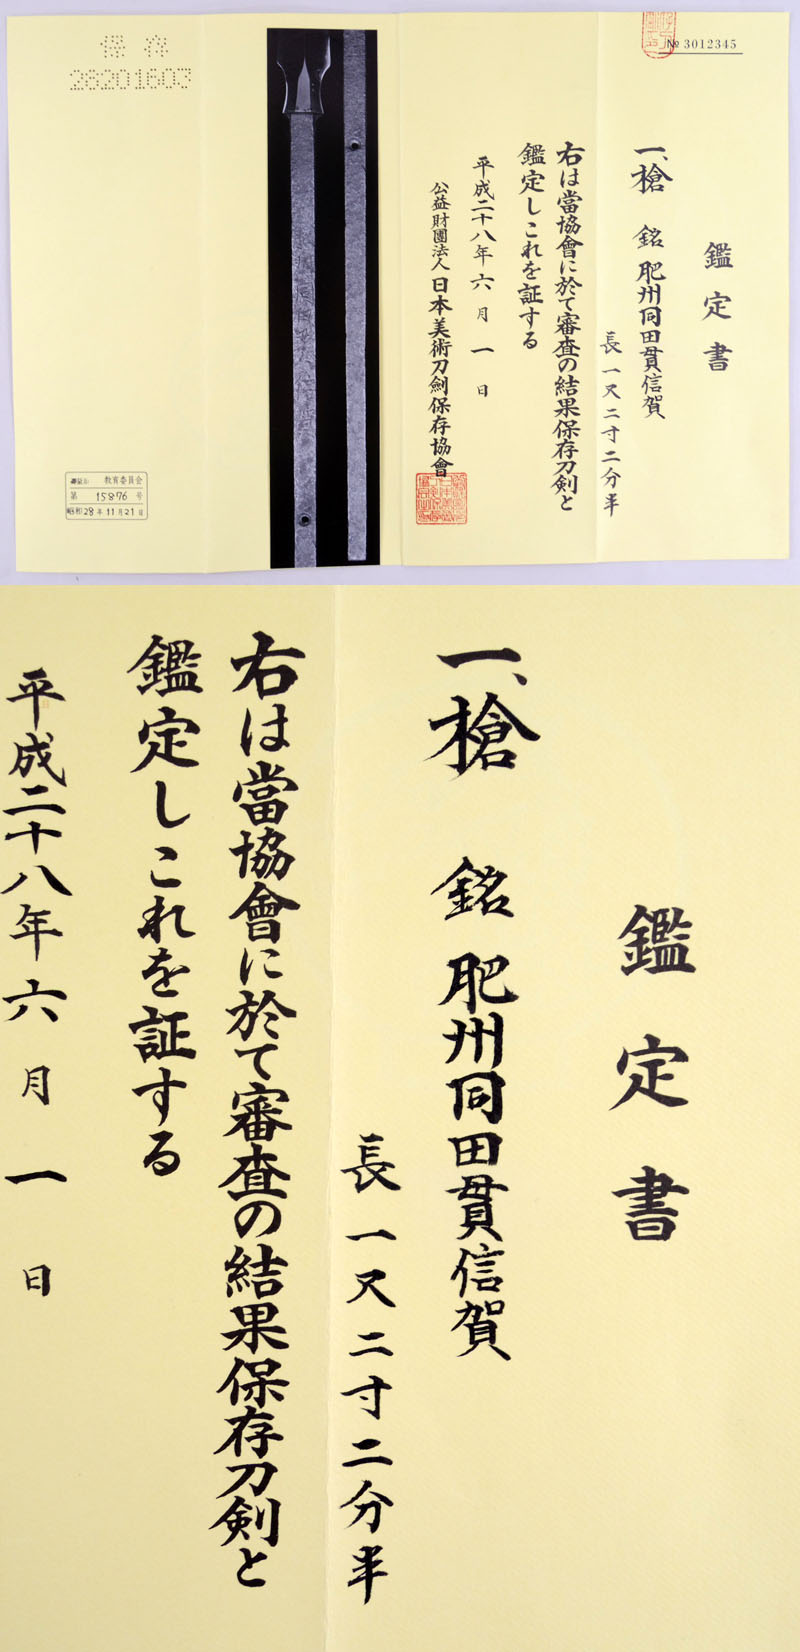 肥州同田貫信賀 Picture of Certificate